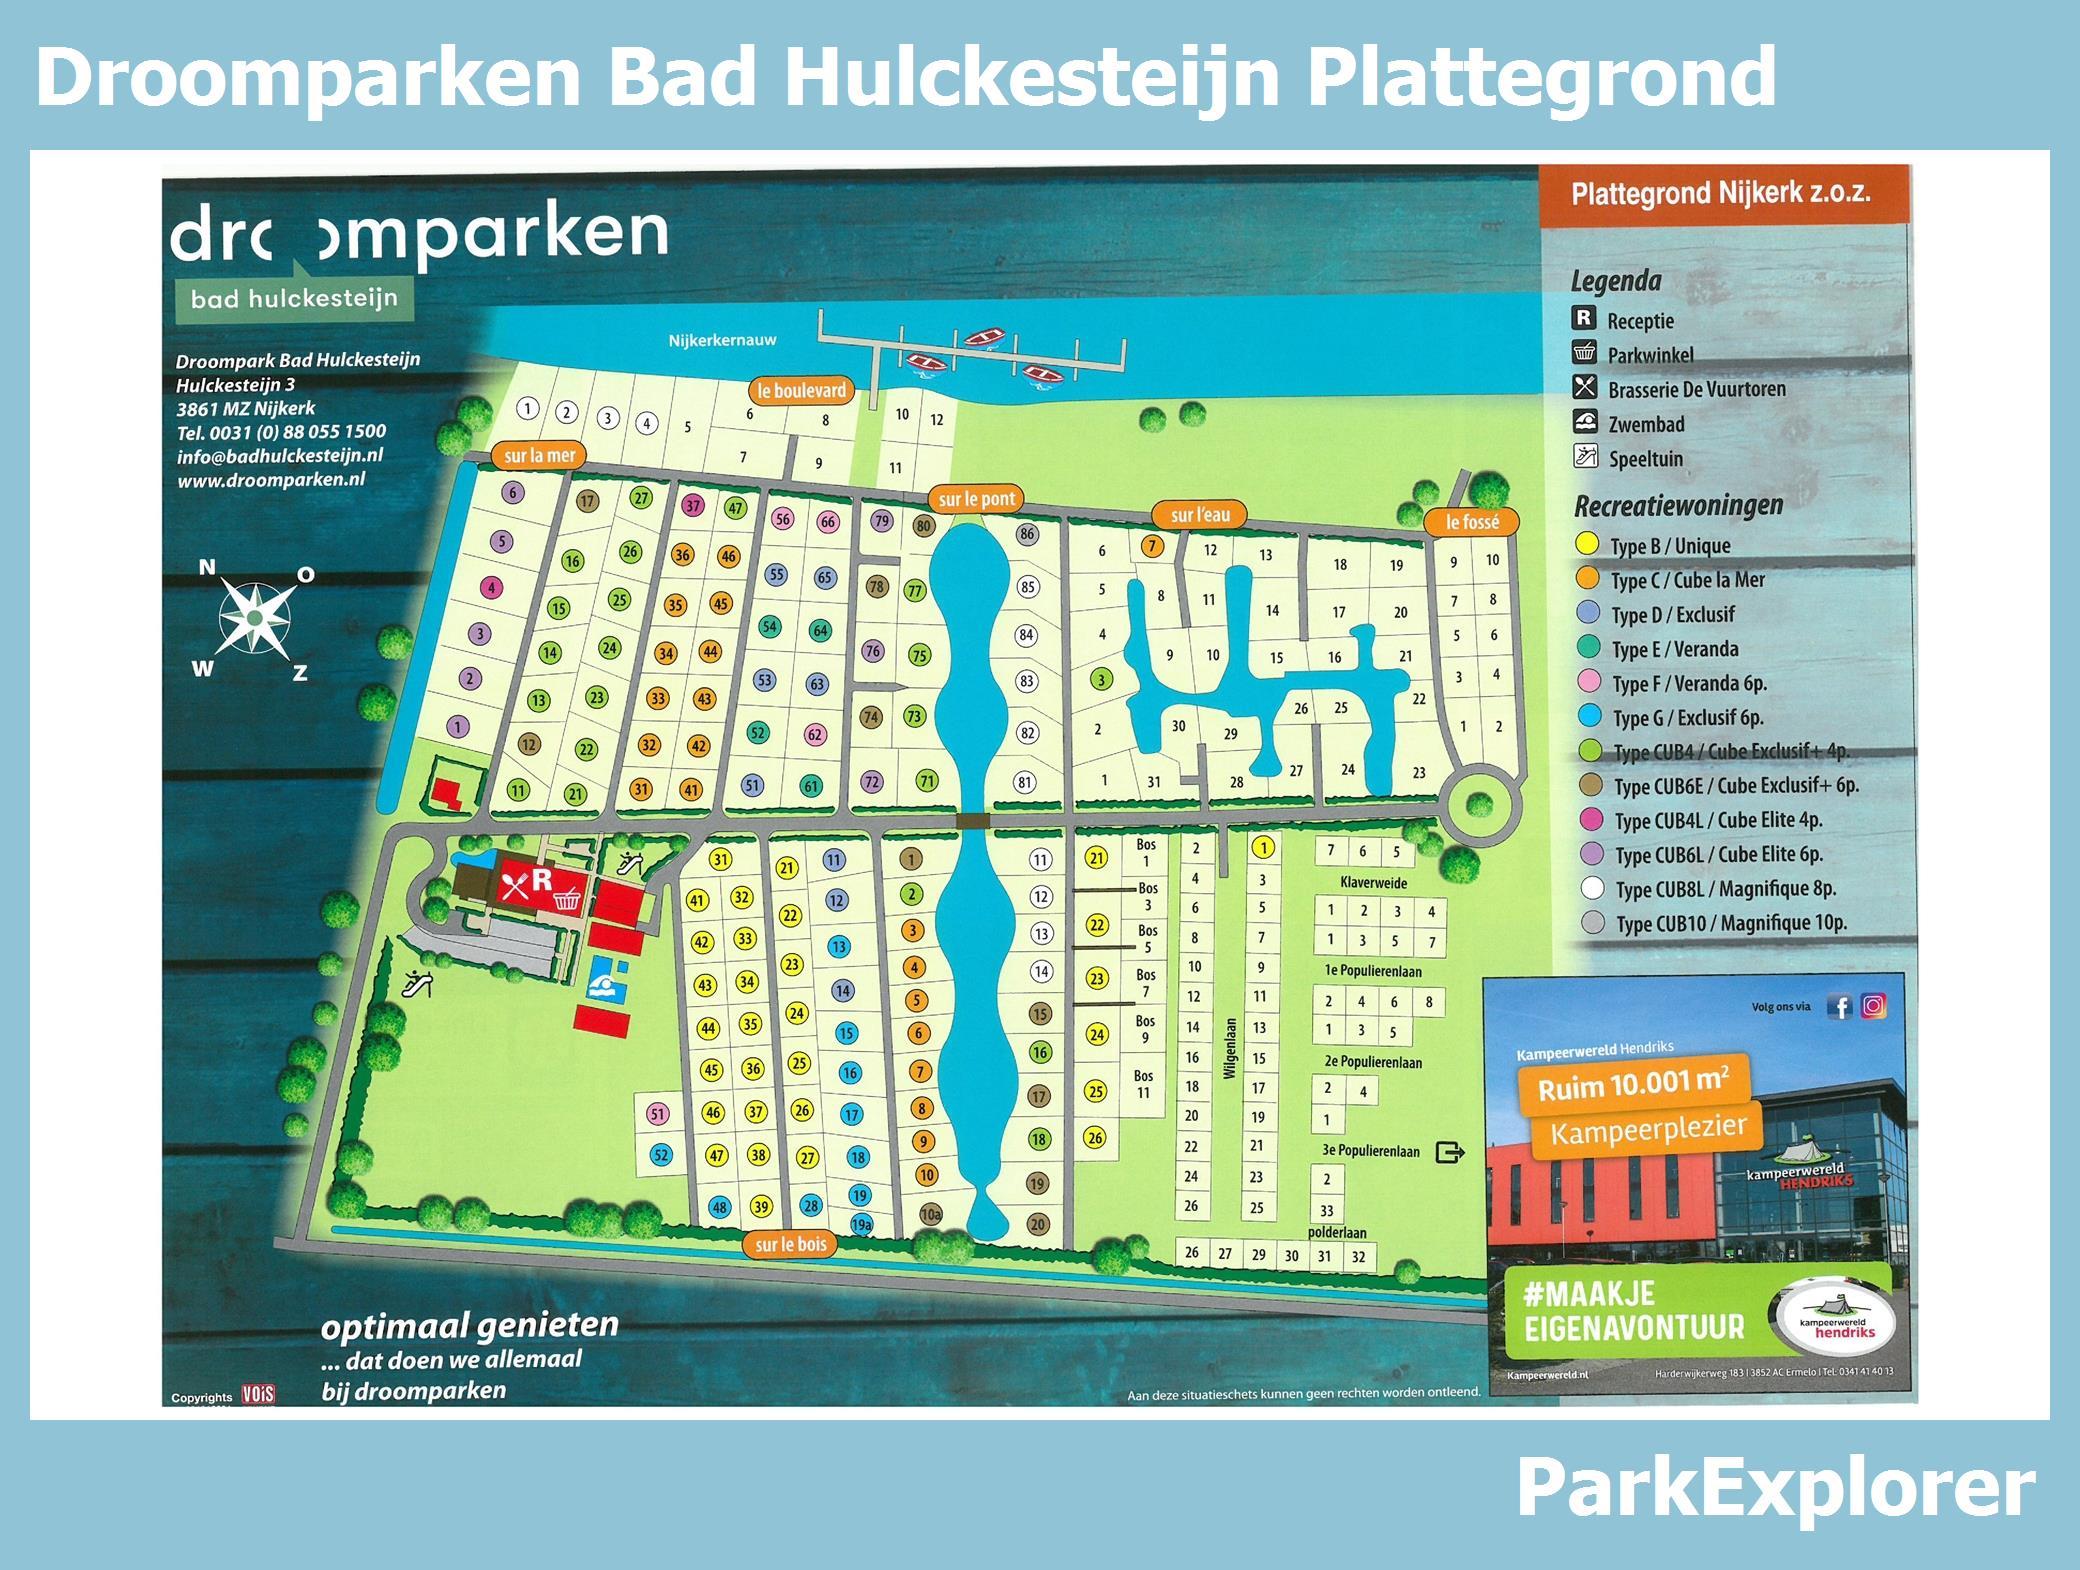 Center Parcs De Eemhof Plattegrond.Px Park Plattegrond Van Droompark Bad Hulckesteijn Parkexplorer Be